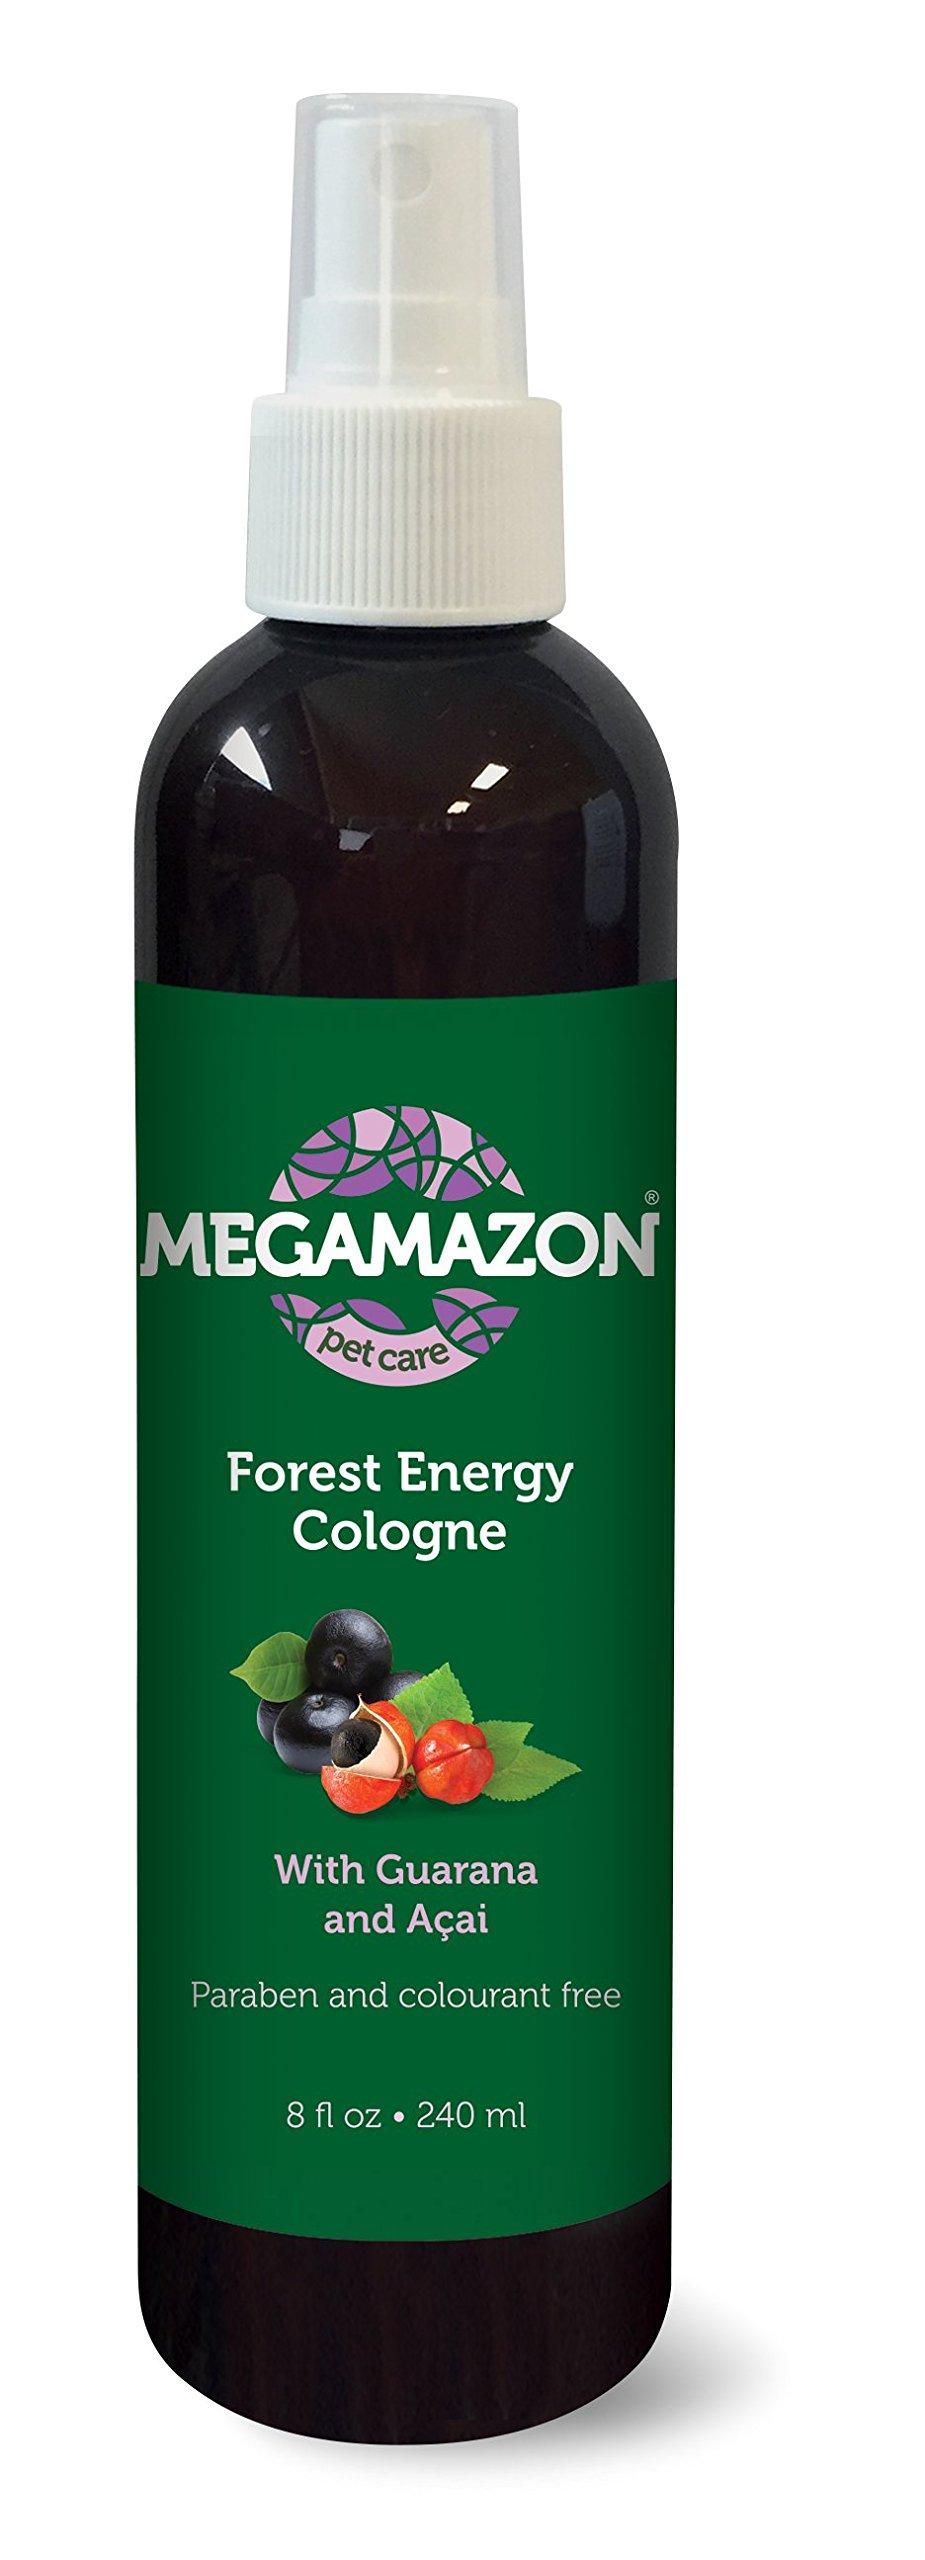 Megamazon Pet Care Forest Energy Cologne